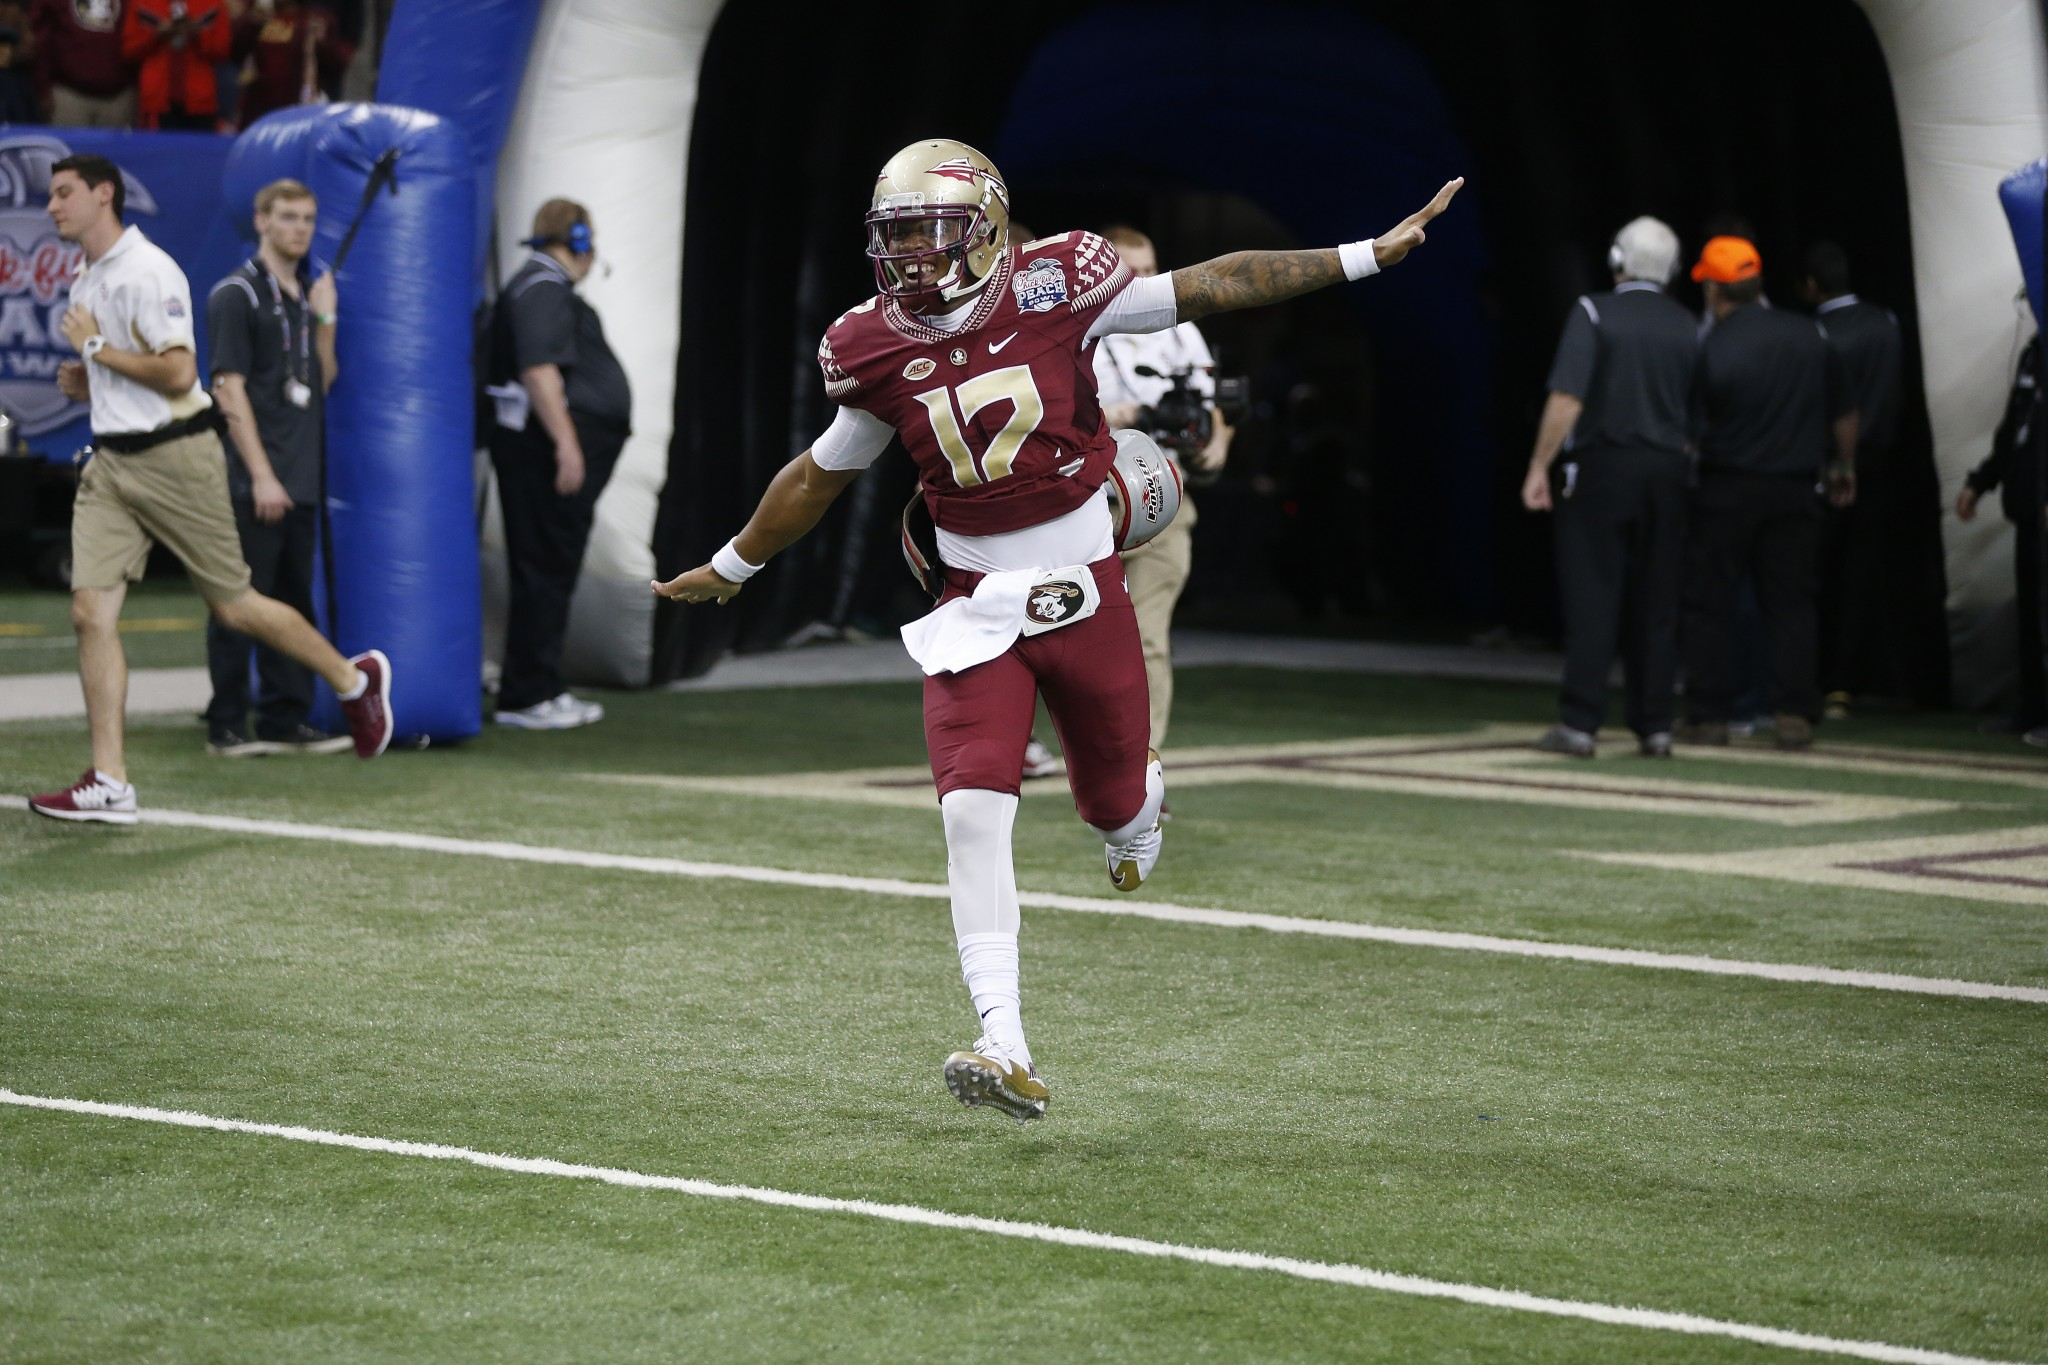 Florida State quarterback Deondre Francois. (AP Photo/John Bazemore)